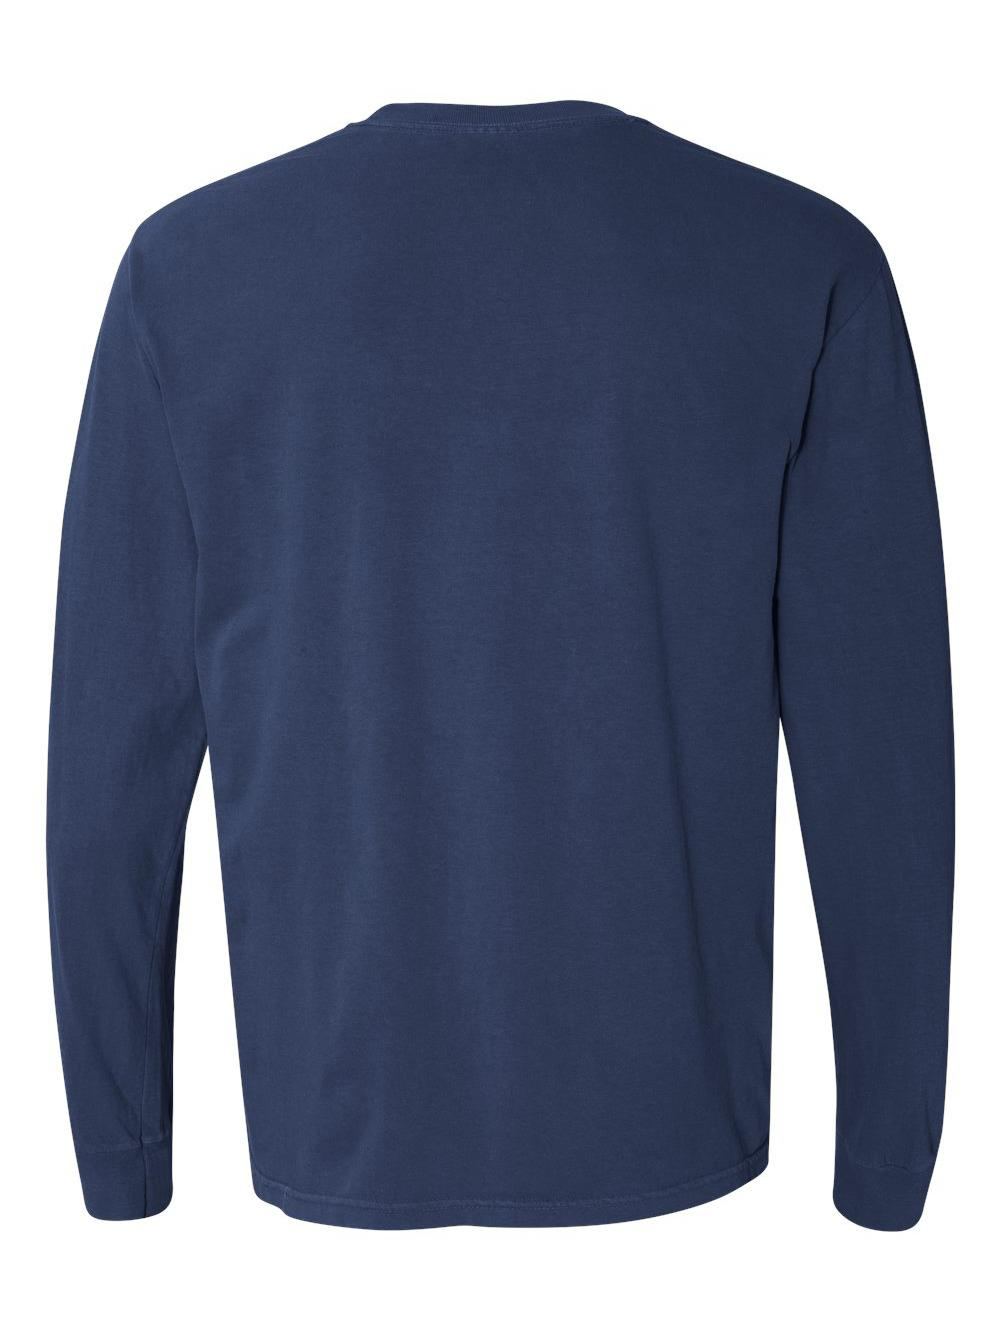 Comfort-Colors-Garment-Dyed-Heavyweight-Ringspun-Long-Sleeve-T-Shirt-6014 thumbnail 64